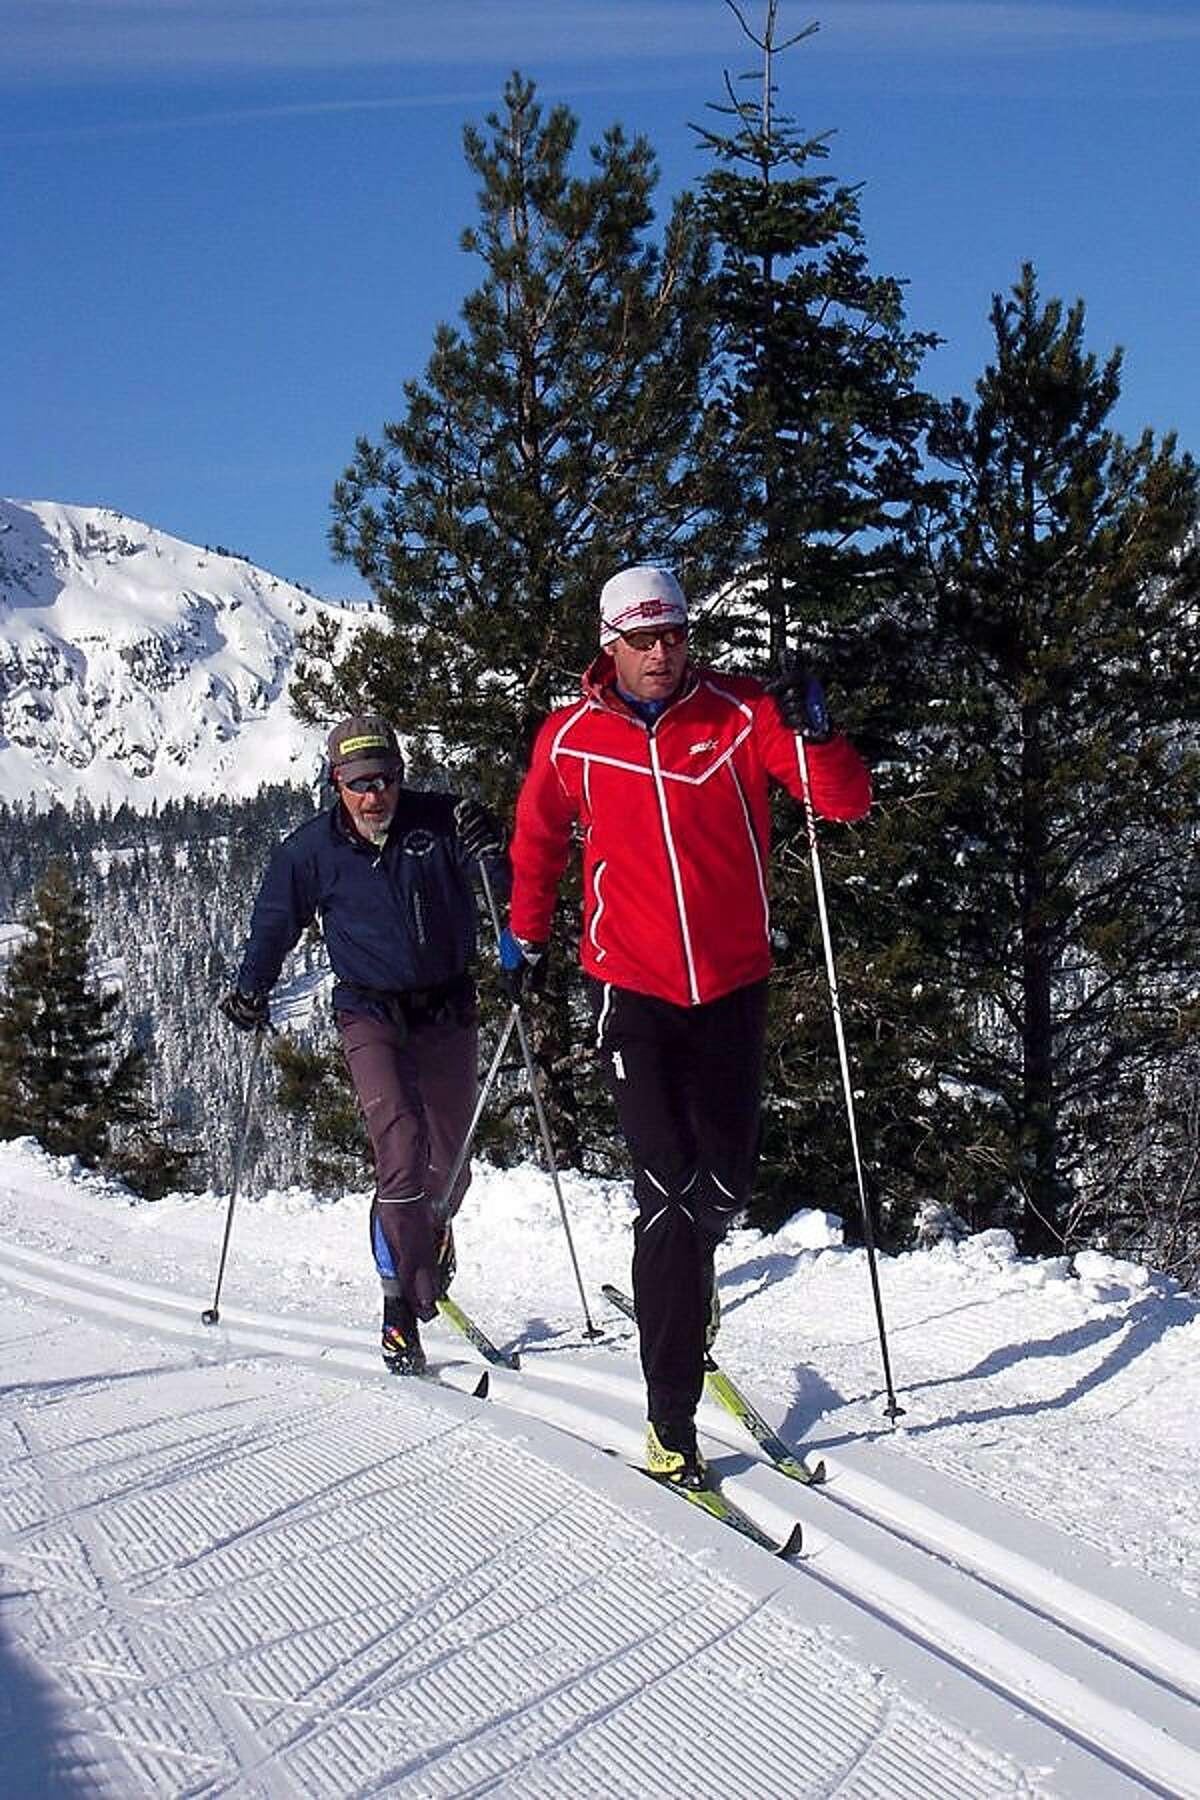 Cross-country skiers in Tahoe Donner.